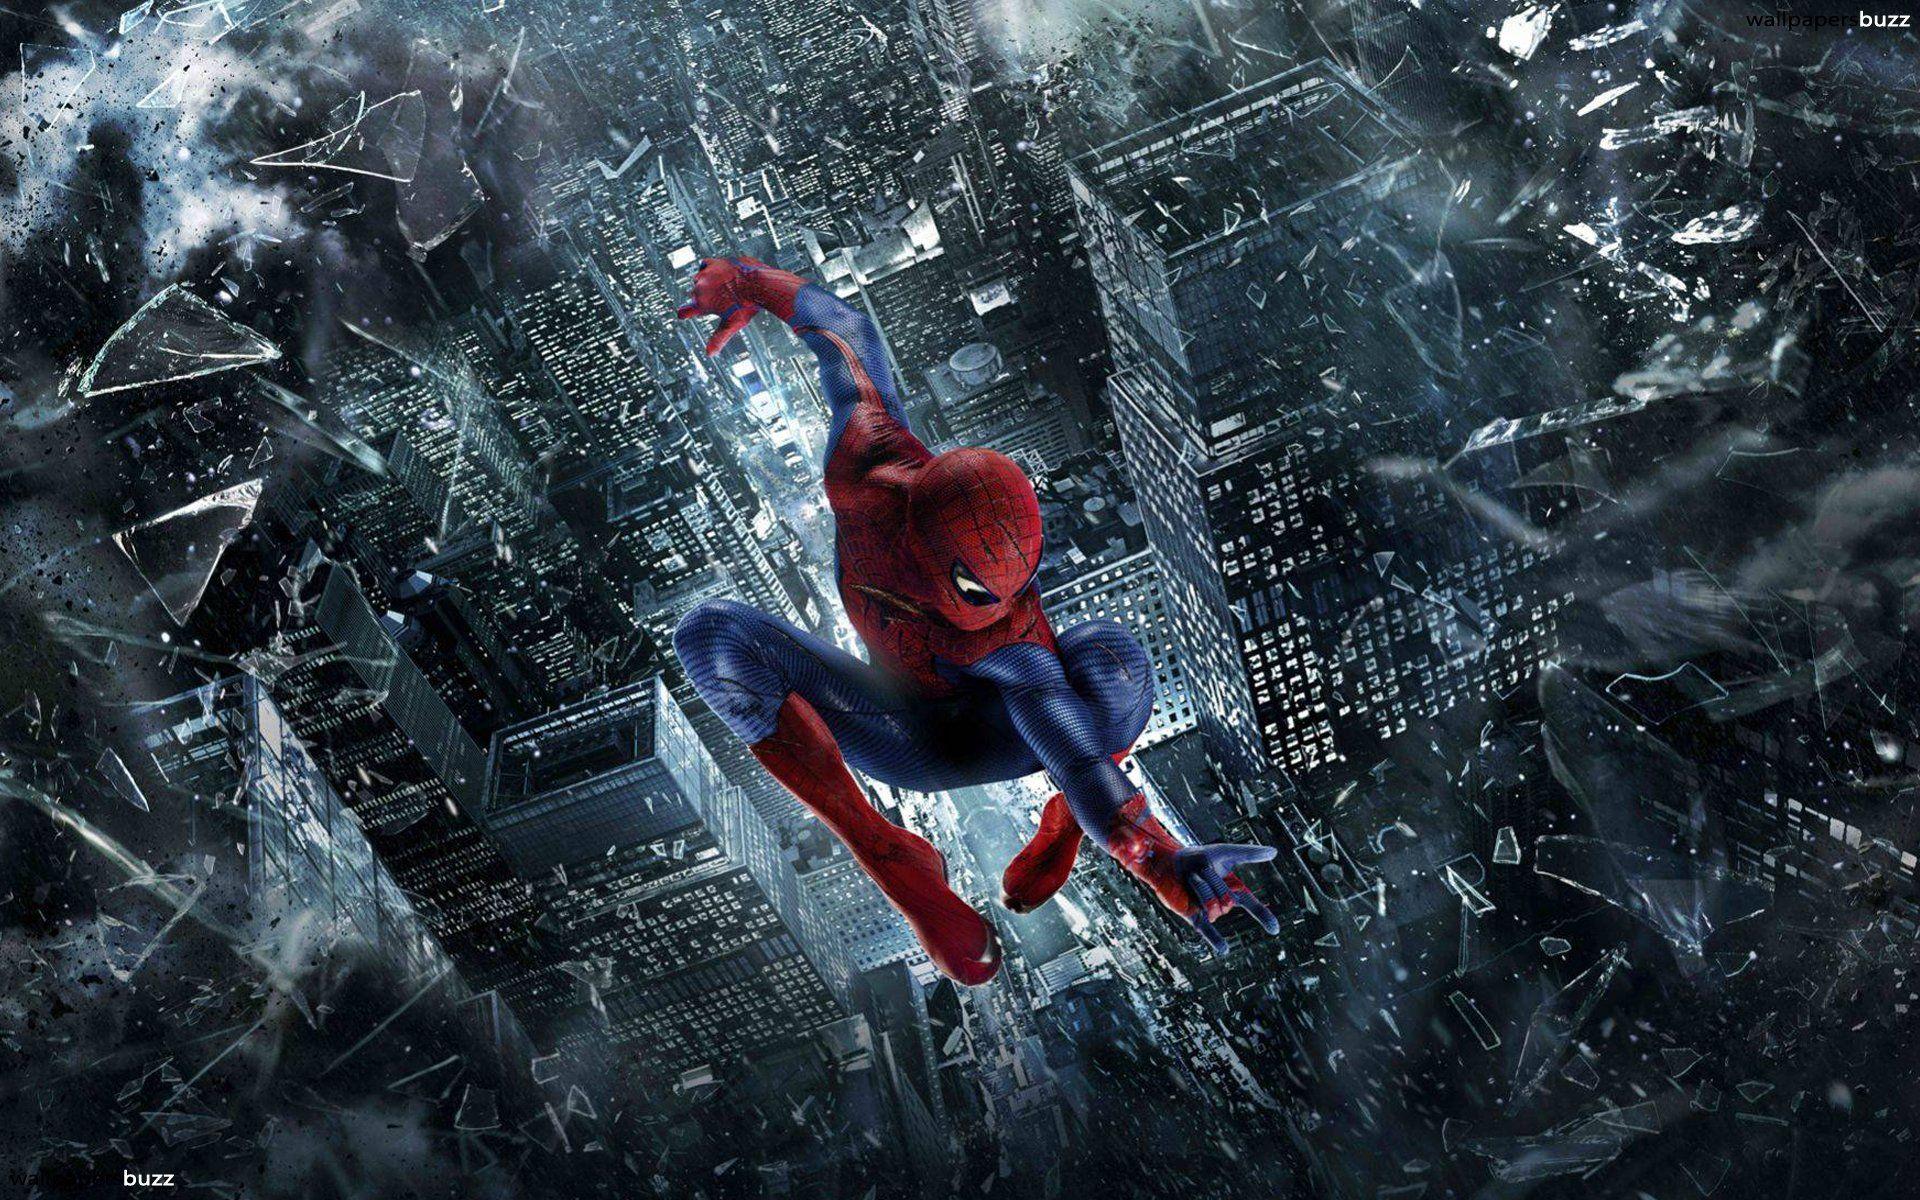 spiderman spiderman jumping wallpaper